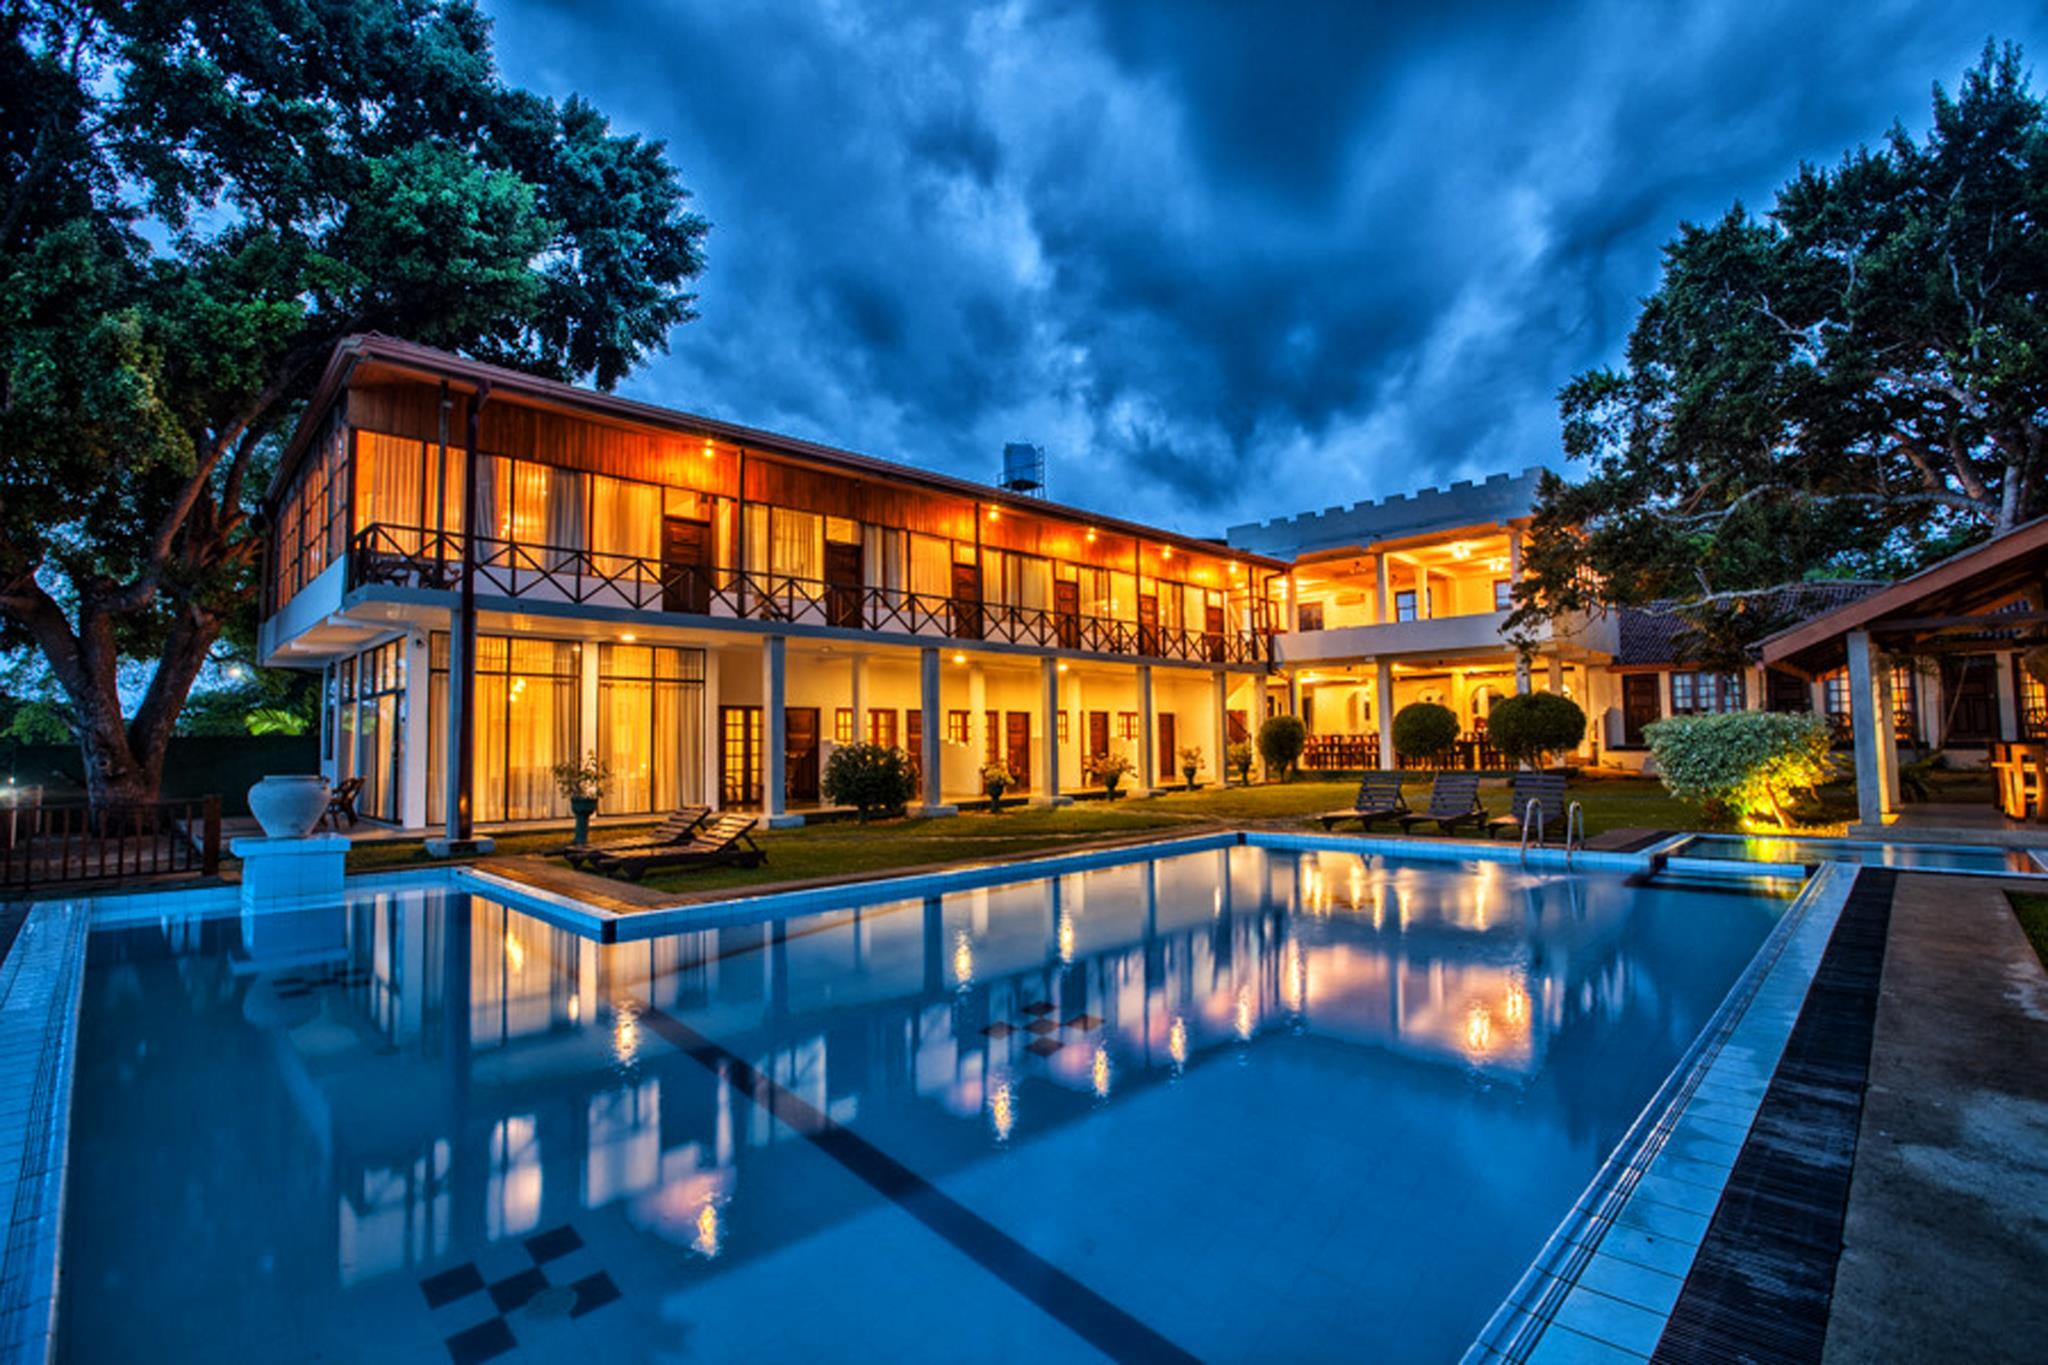 Oak Ray Lake Resort